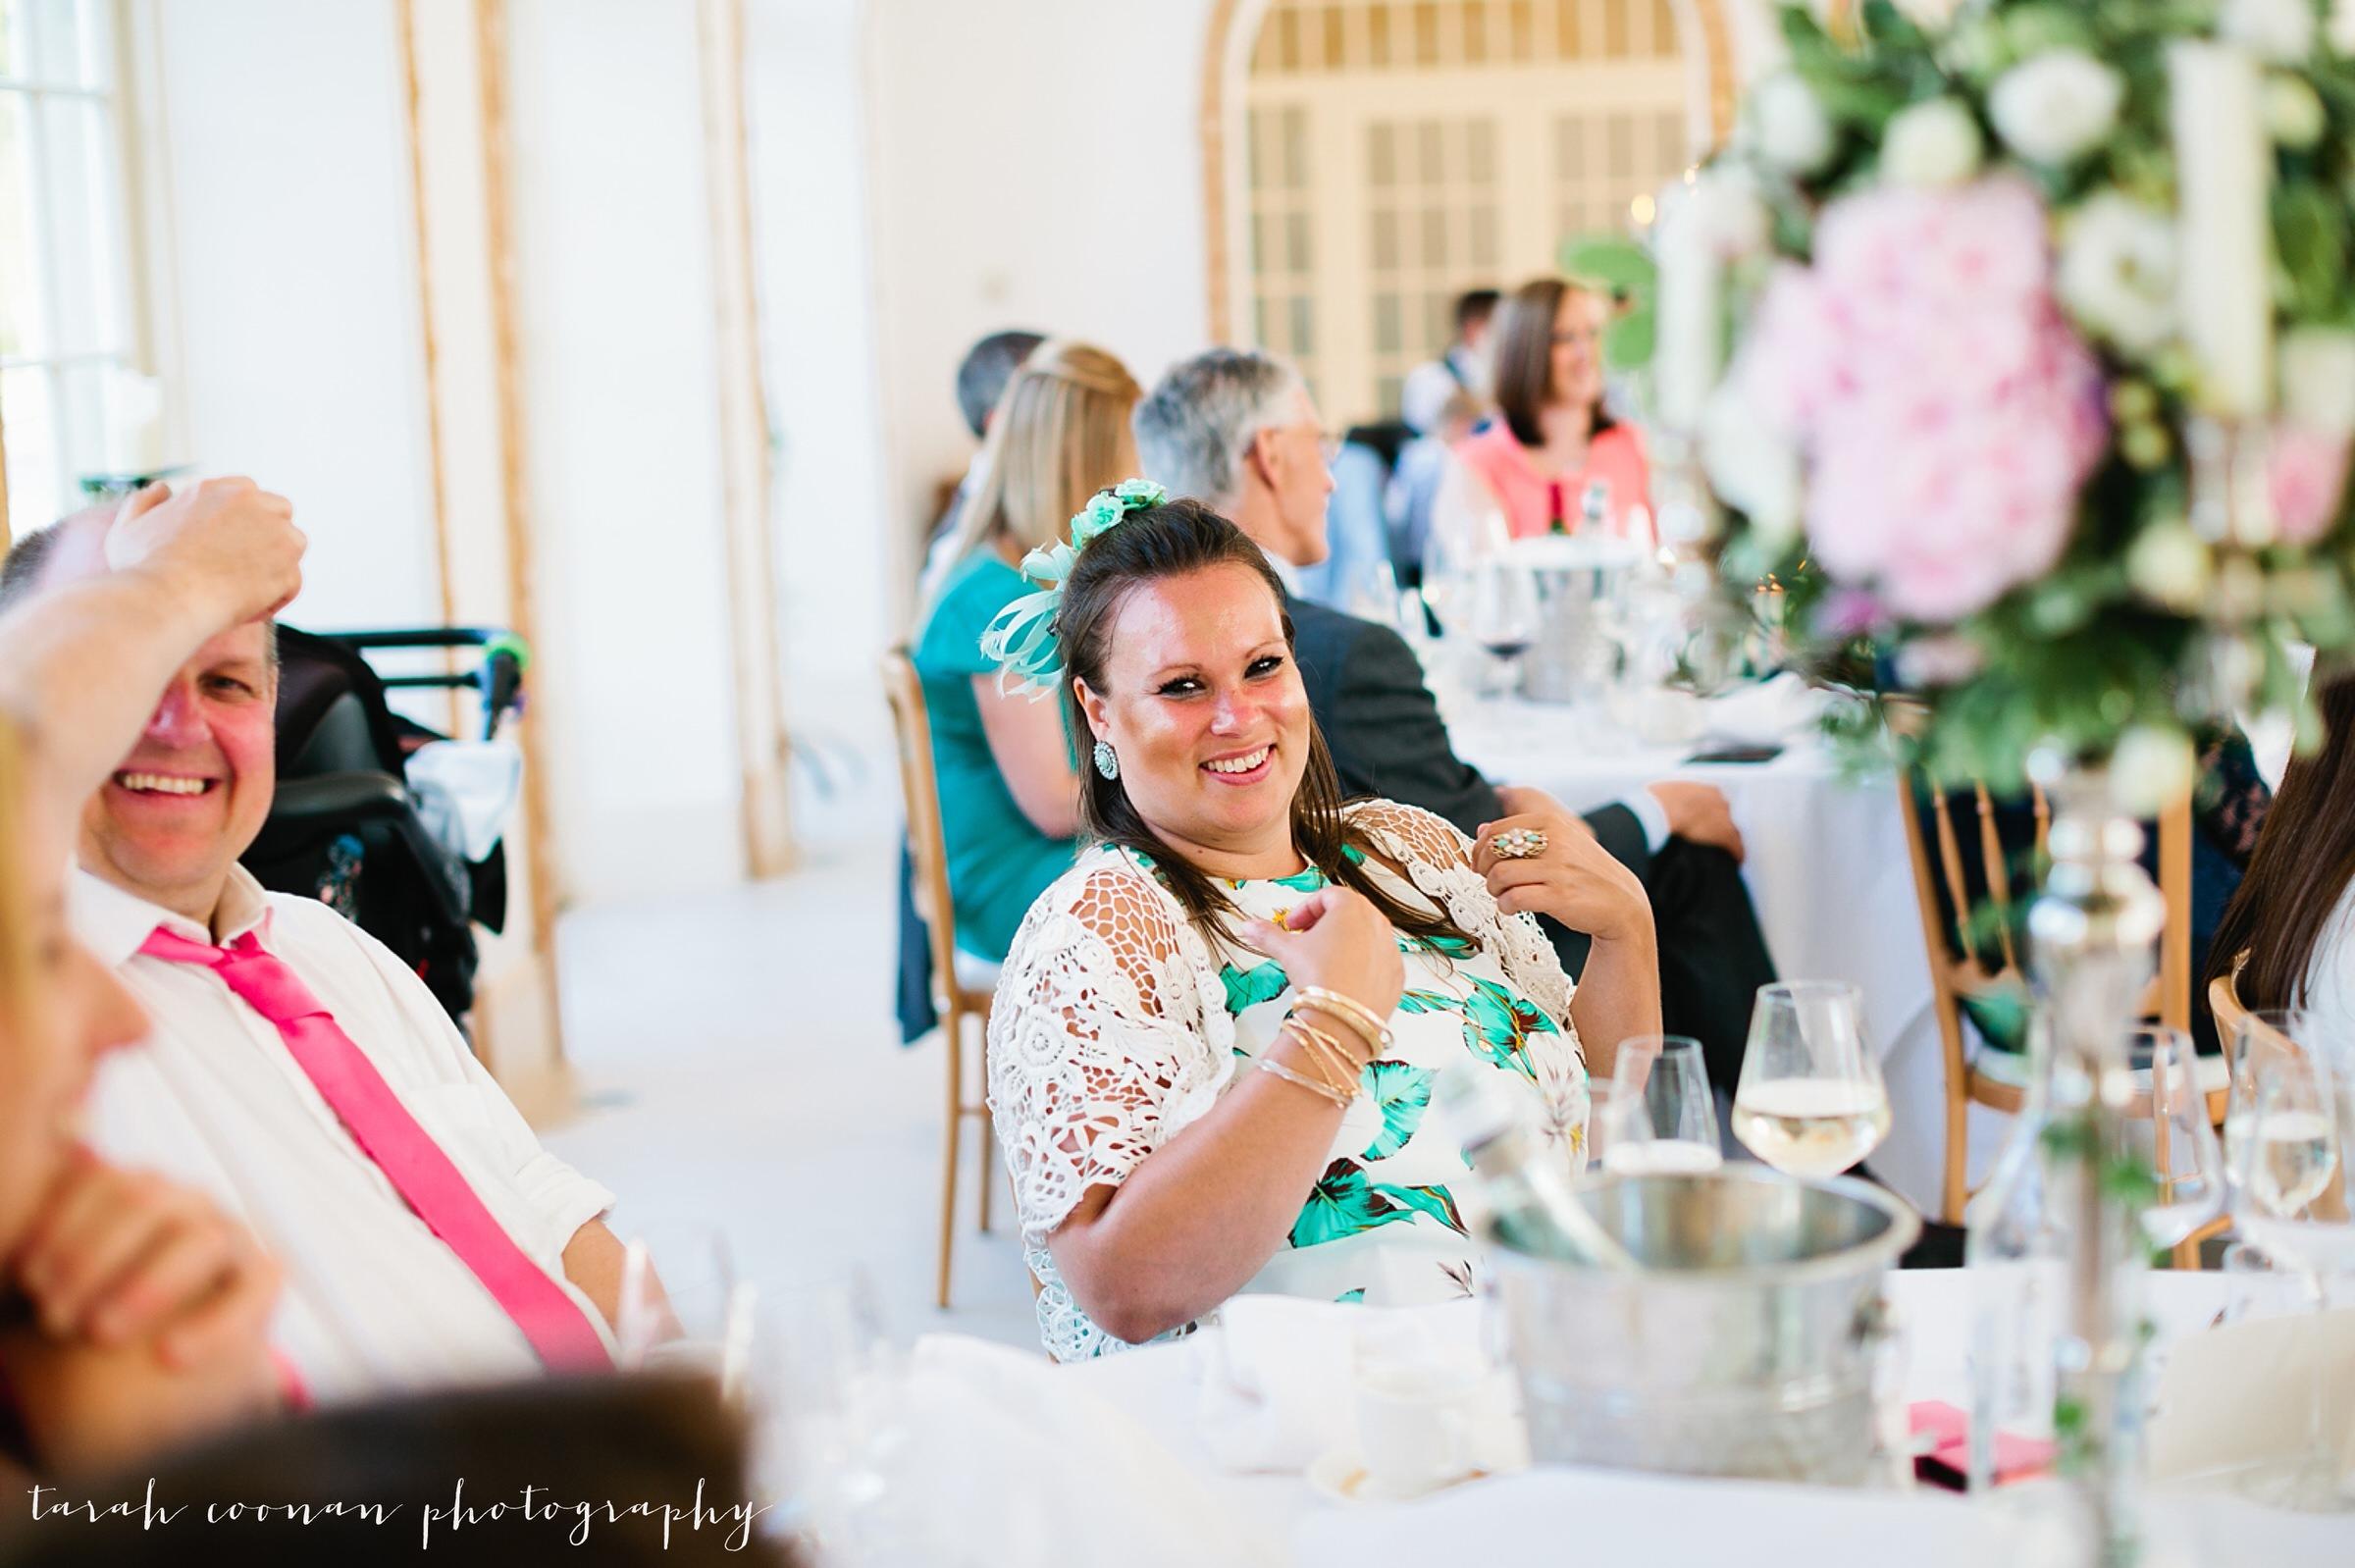 northbrook-park-wedding-photographer_070